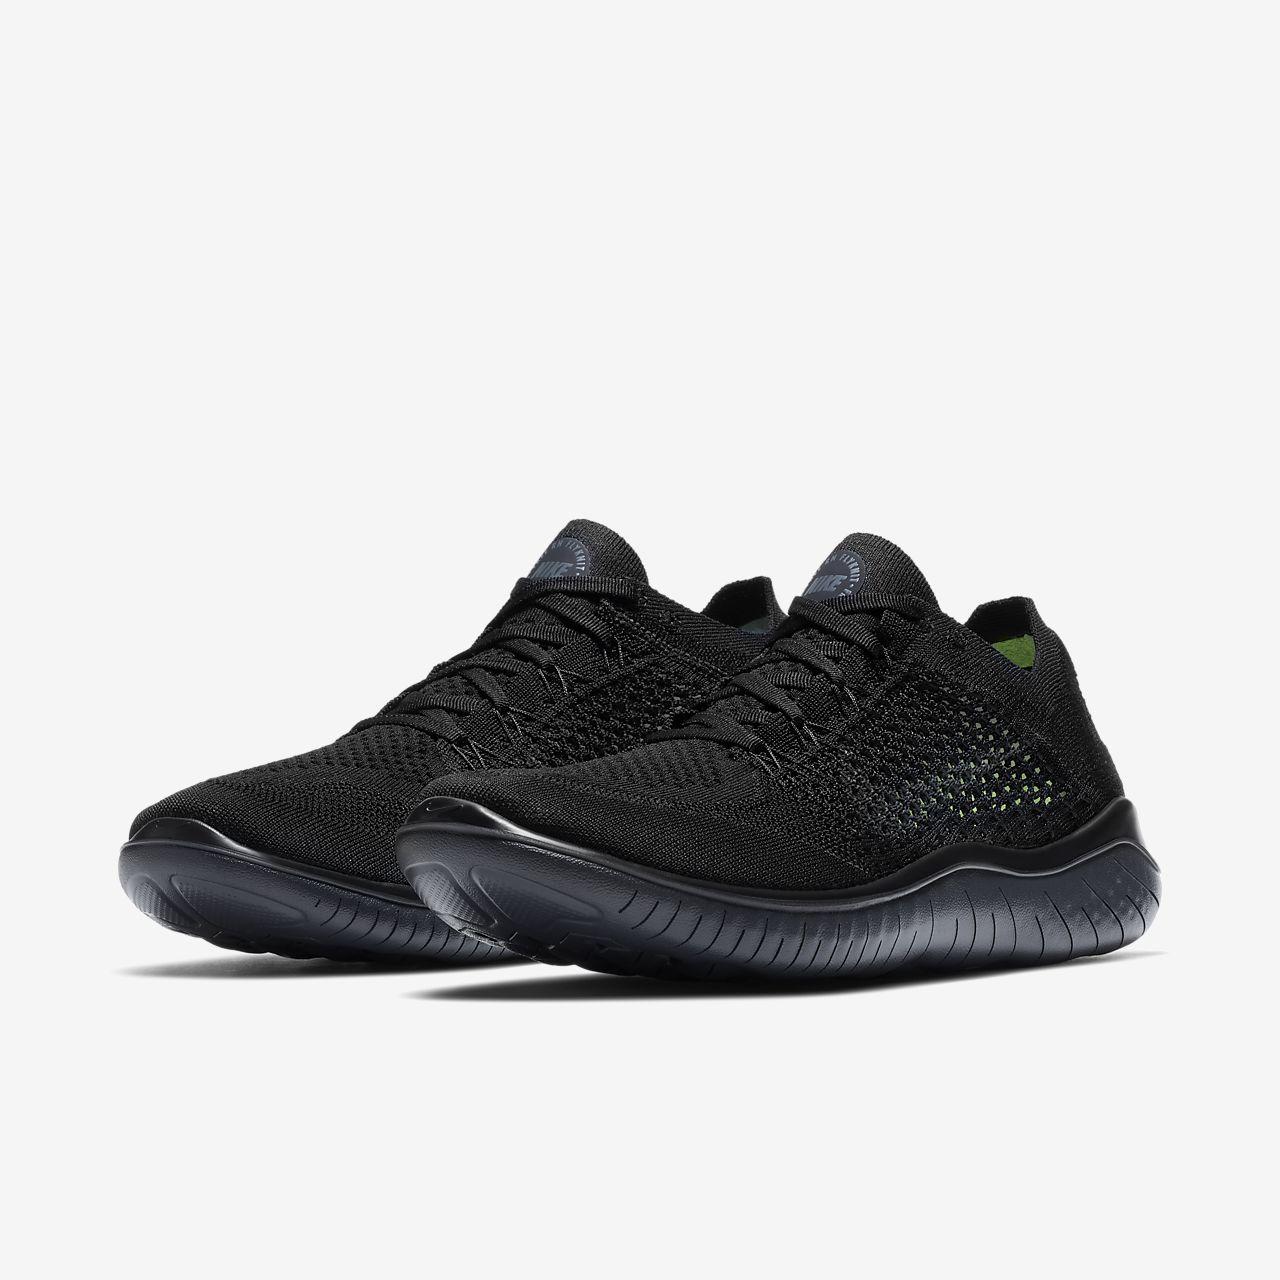 Nike Free Rn Flyknit 2018 Chaussure De Course